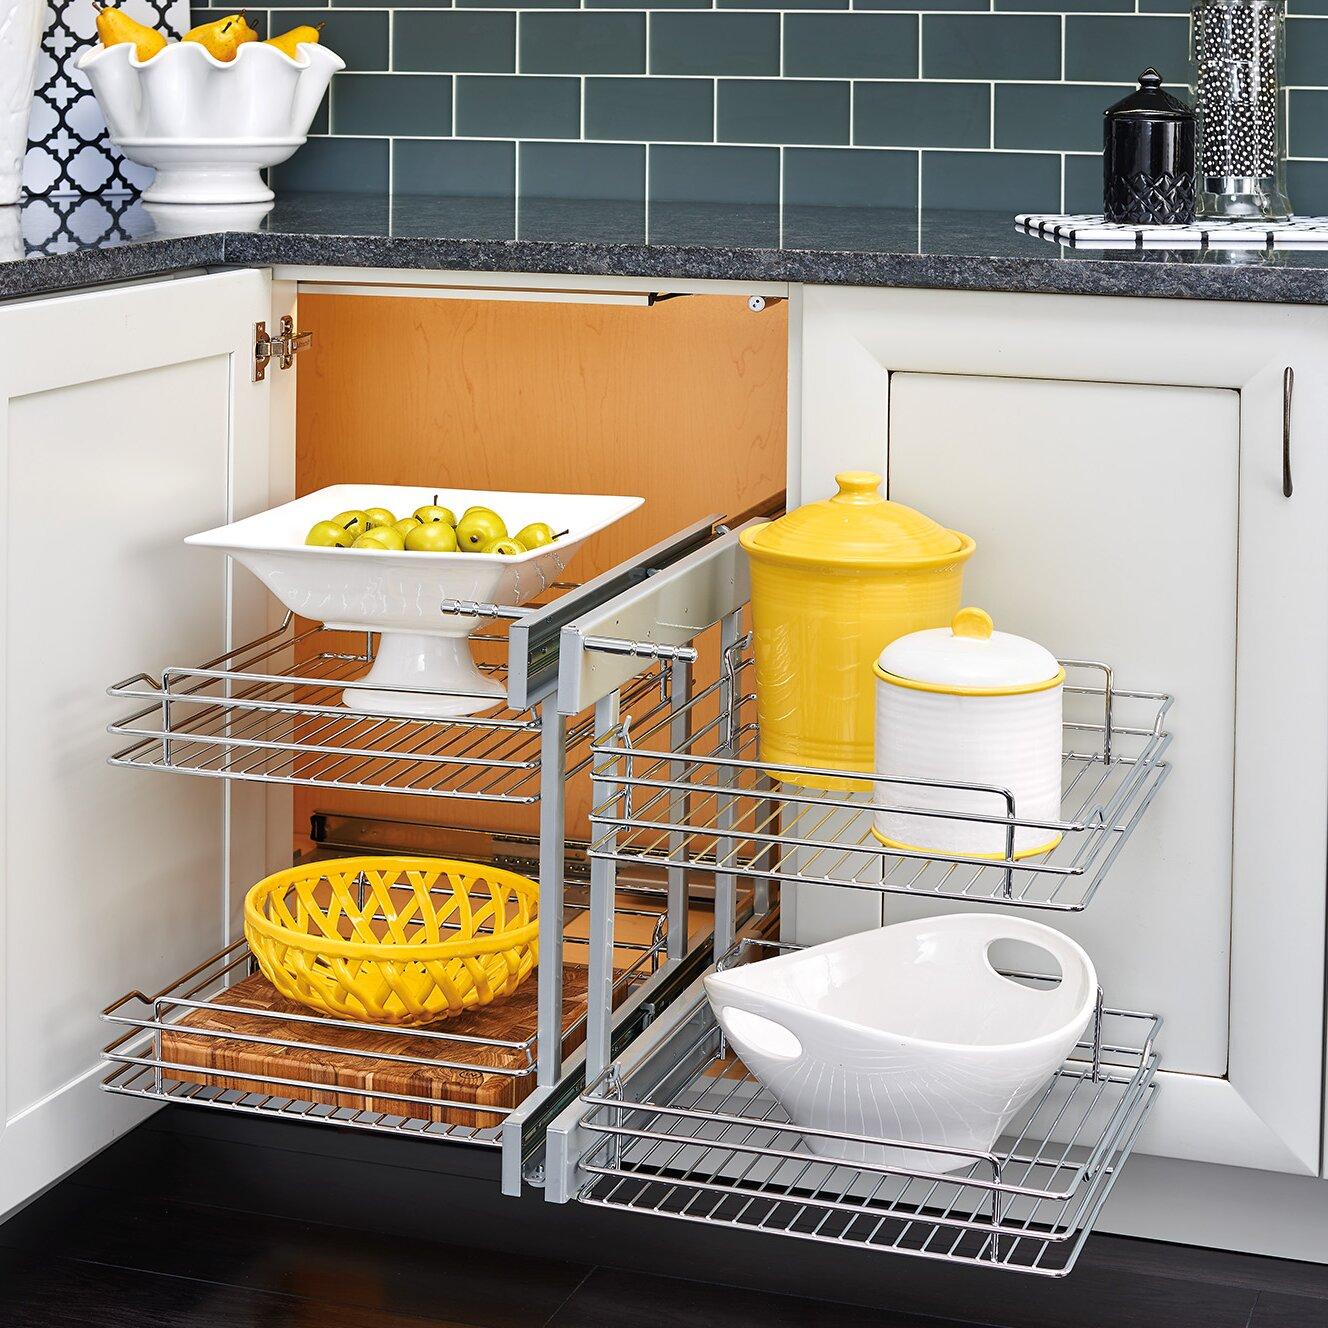 Rev-A-Shelf Blind Corner Cabinet Pull-Out Chrome 2-Tier ...